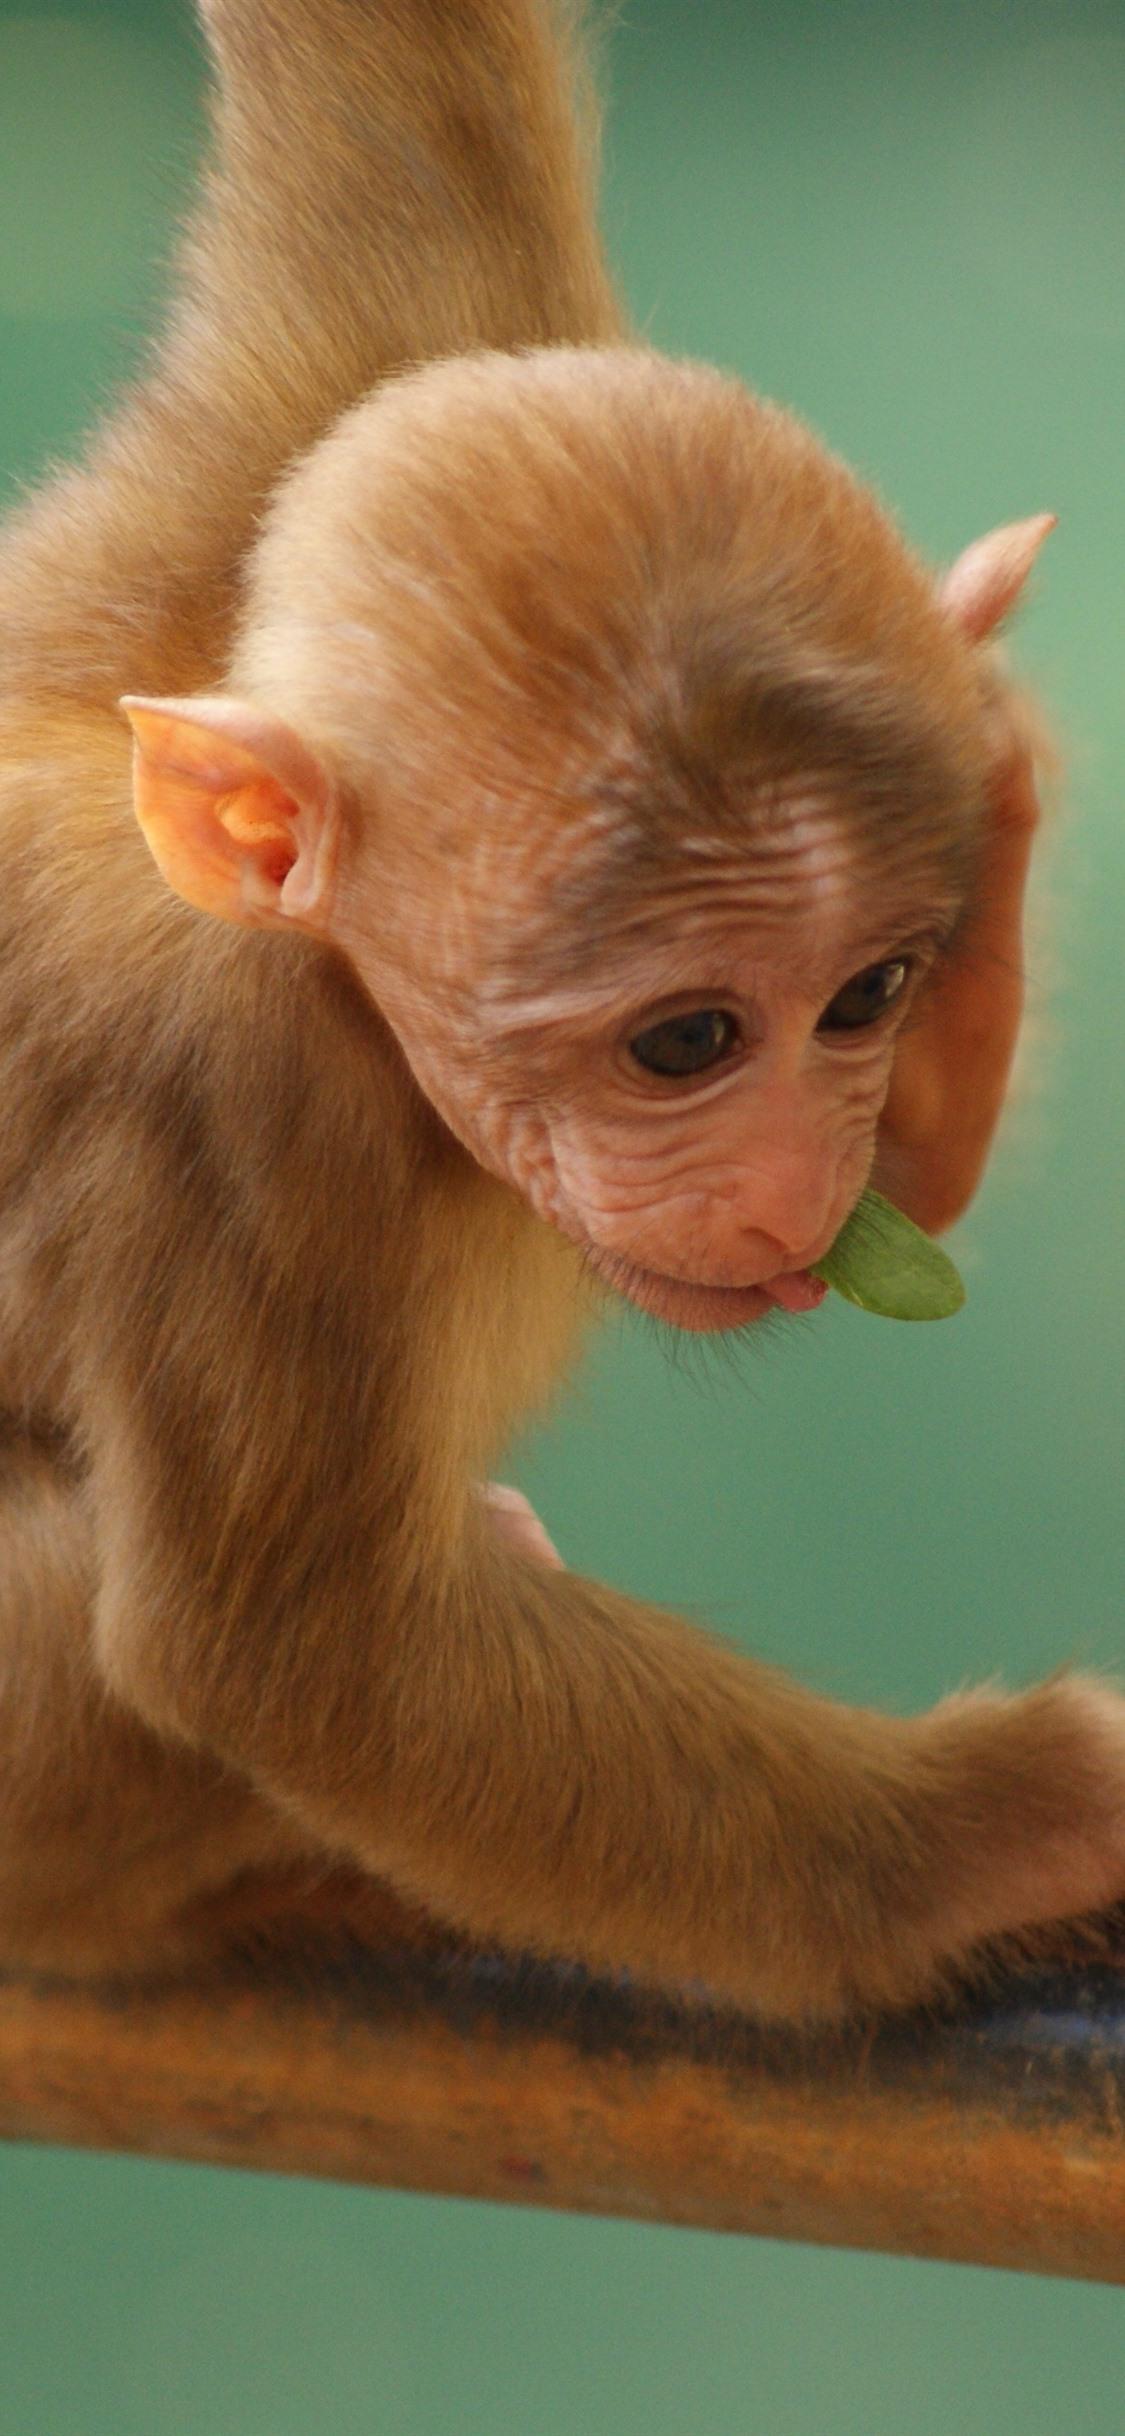 Cute Small Monkey 1125x2436 Iphone Xs X Wallpaper